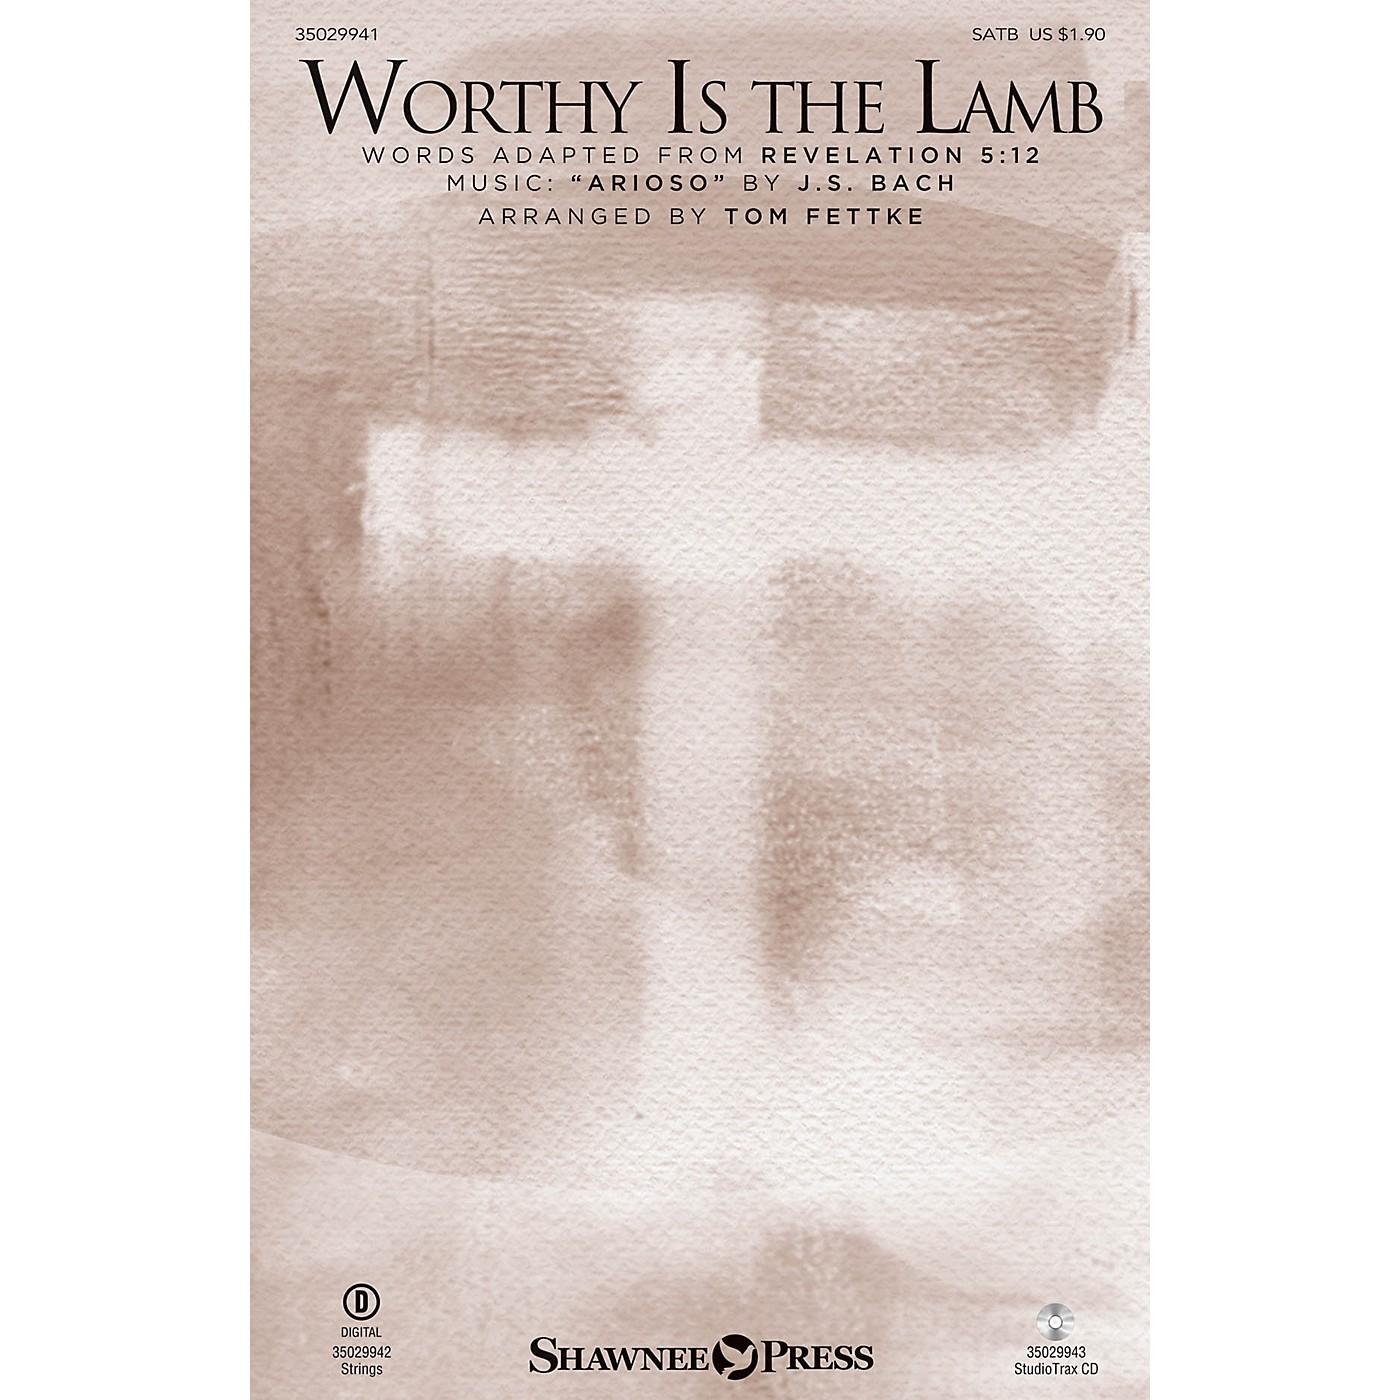 Shawnee Press Worthy Is the Lamb SATB arranged by Tom Fettke thumbnail